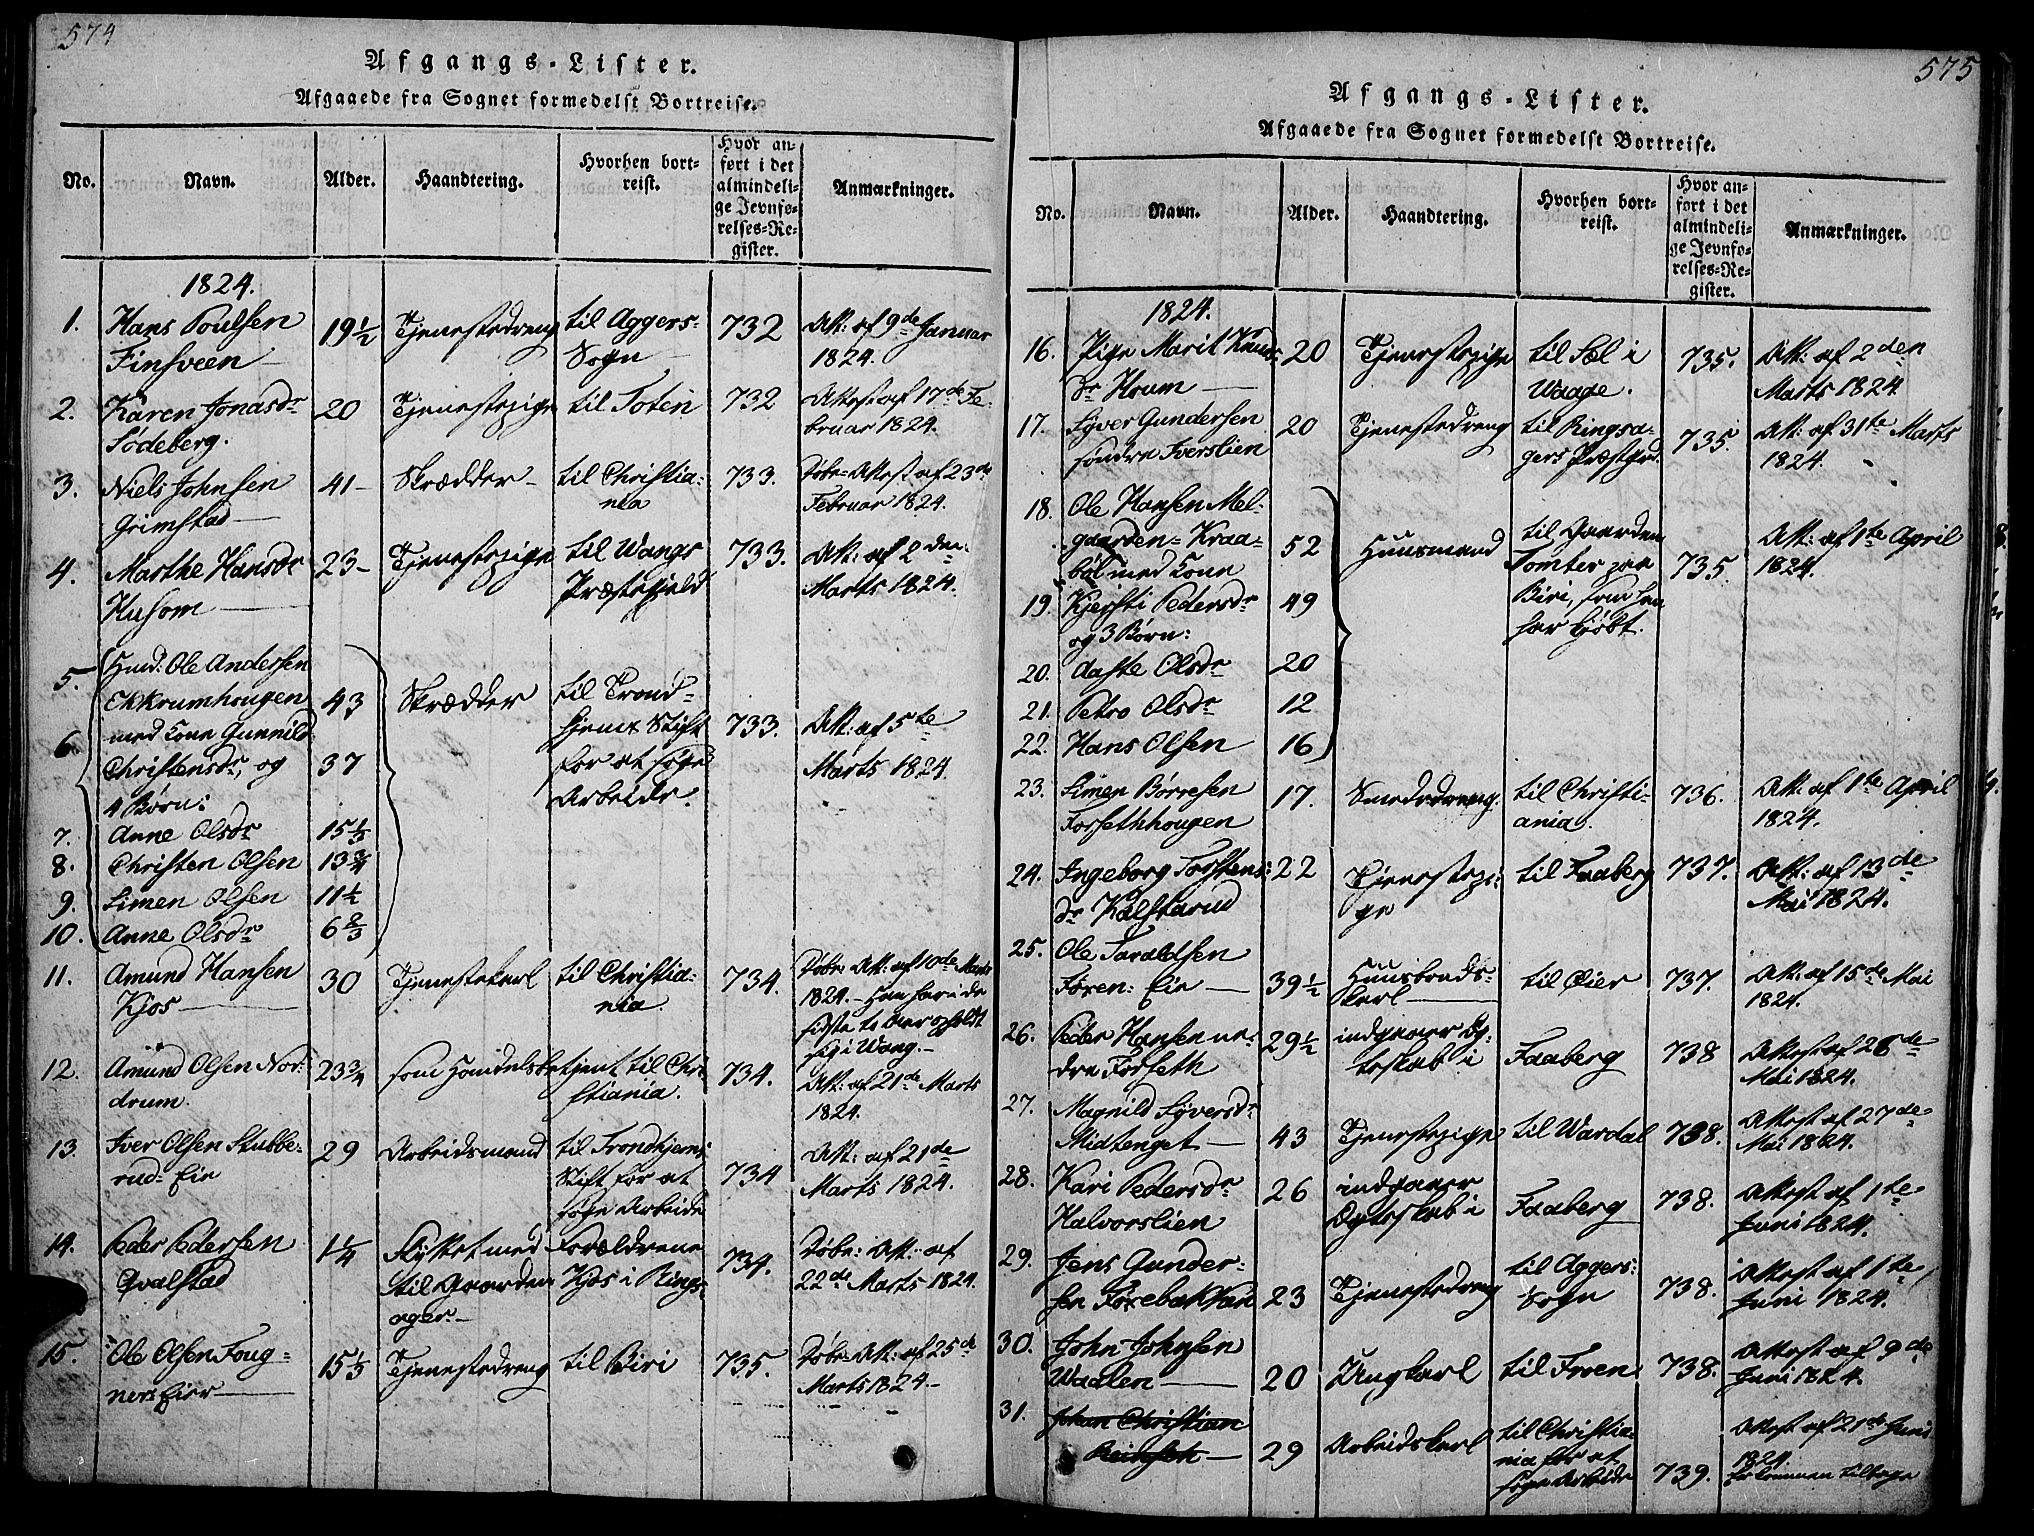 SAH, Gausdal prestekontor, Ministerialbok nr. 5, 1817-1829, s. 574-575